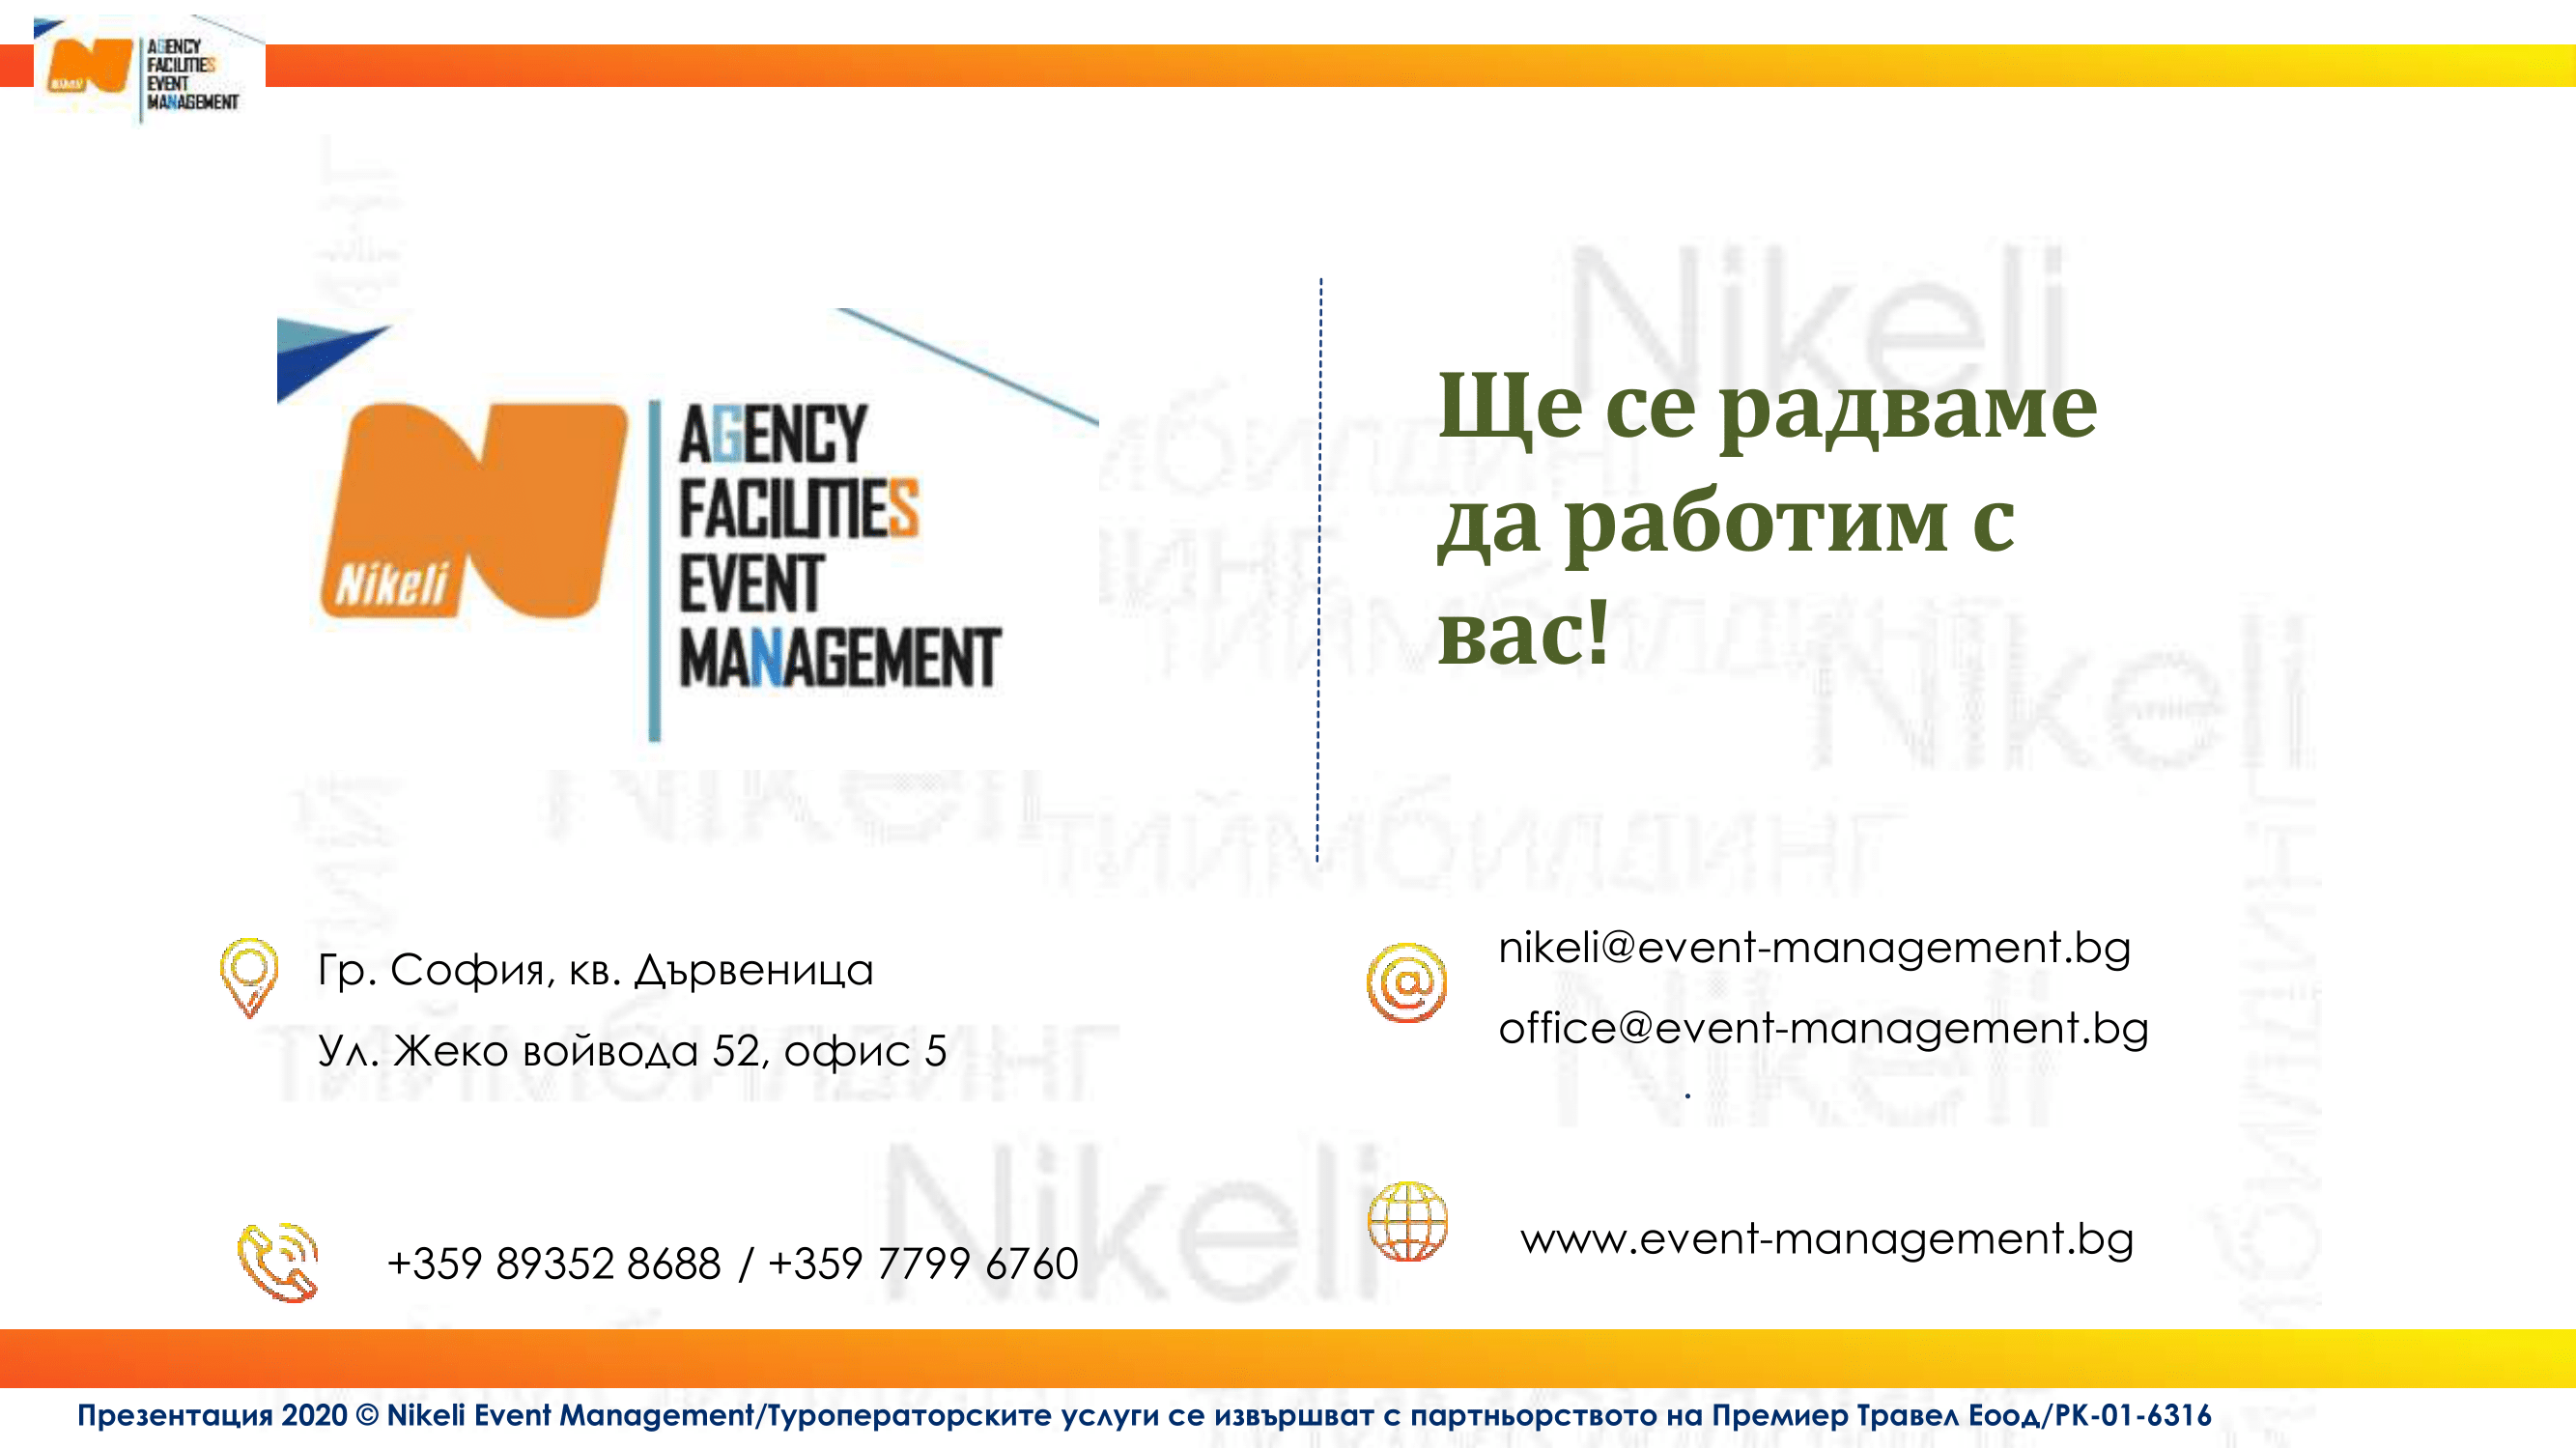 TeamBuilding-Nikeli-Event-Managemen-REA-2020-18